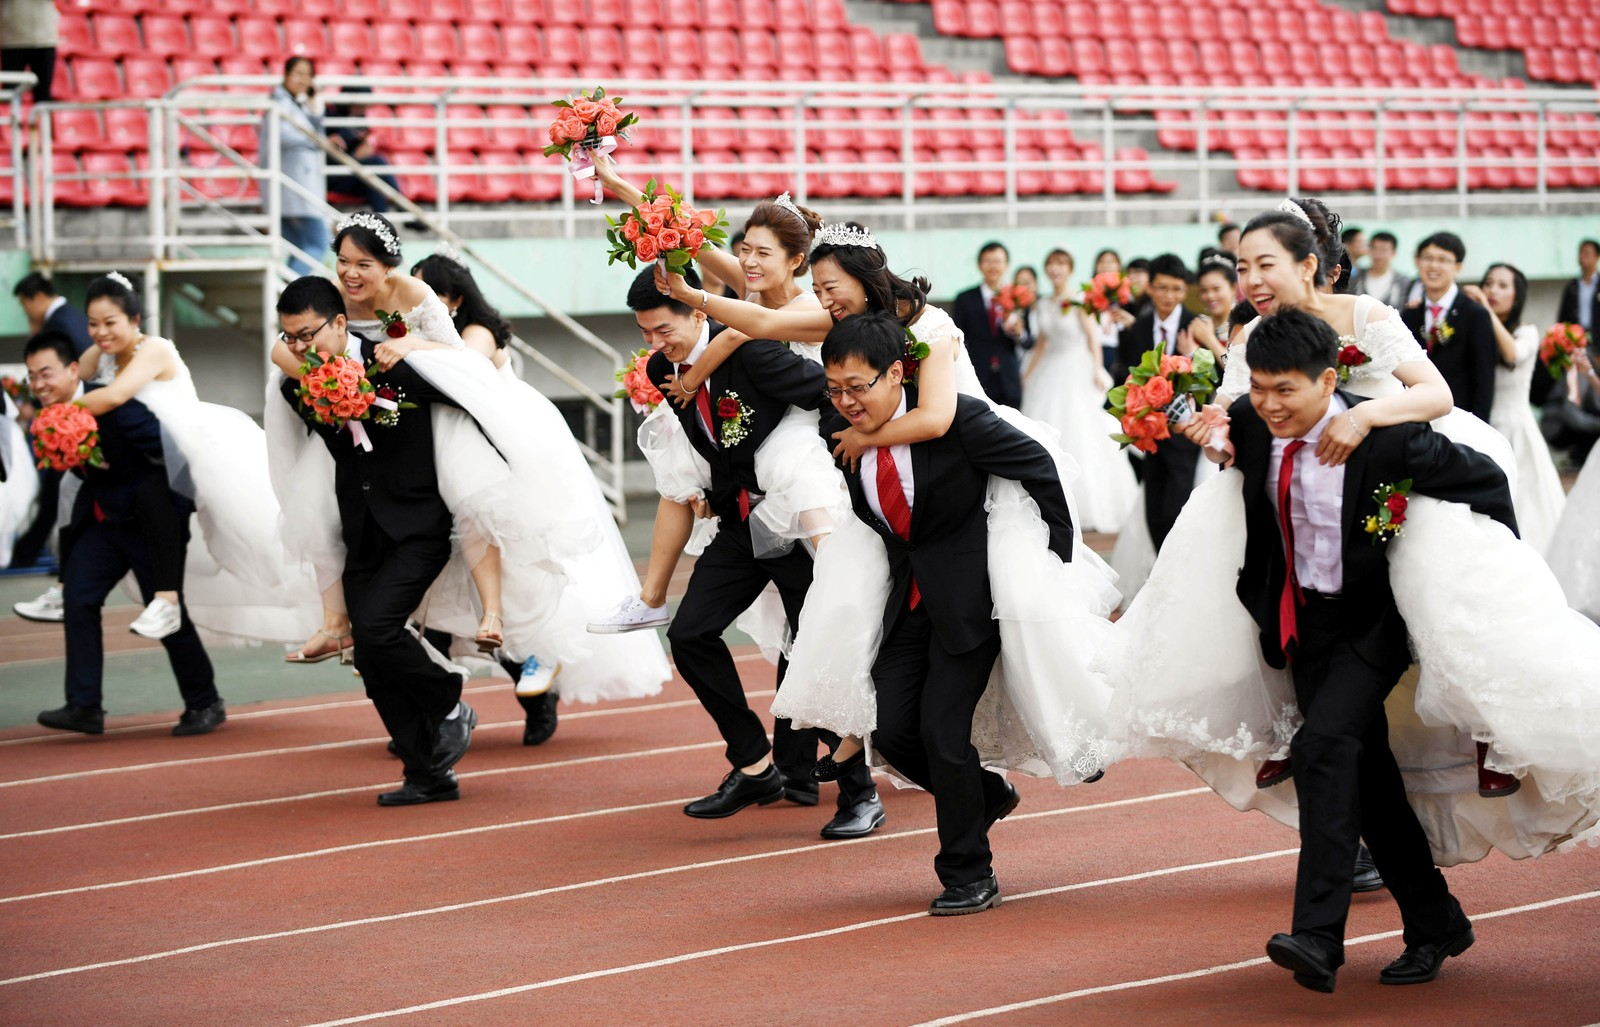 Konebærekonkurranse ved et kinesisk universitet der 64 par gifta seg samtidig.